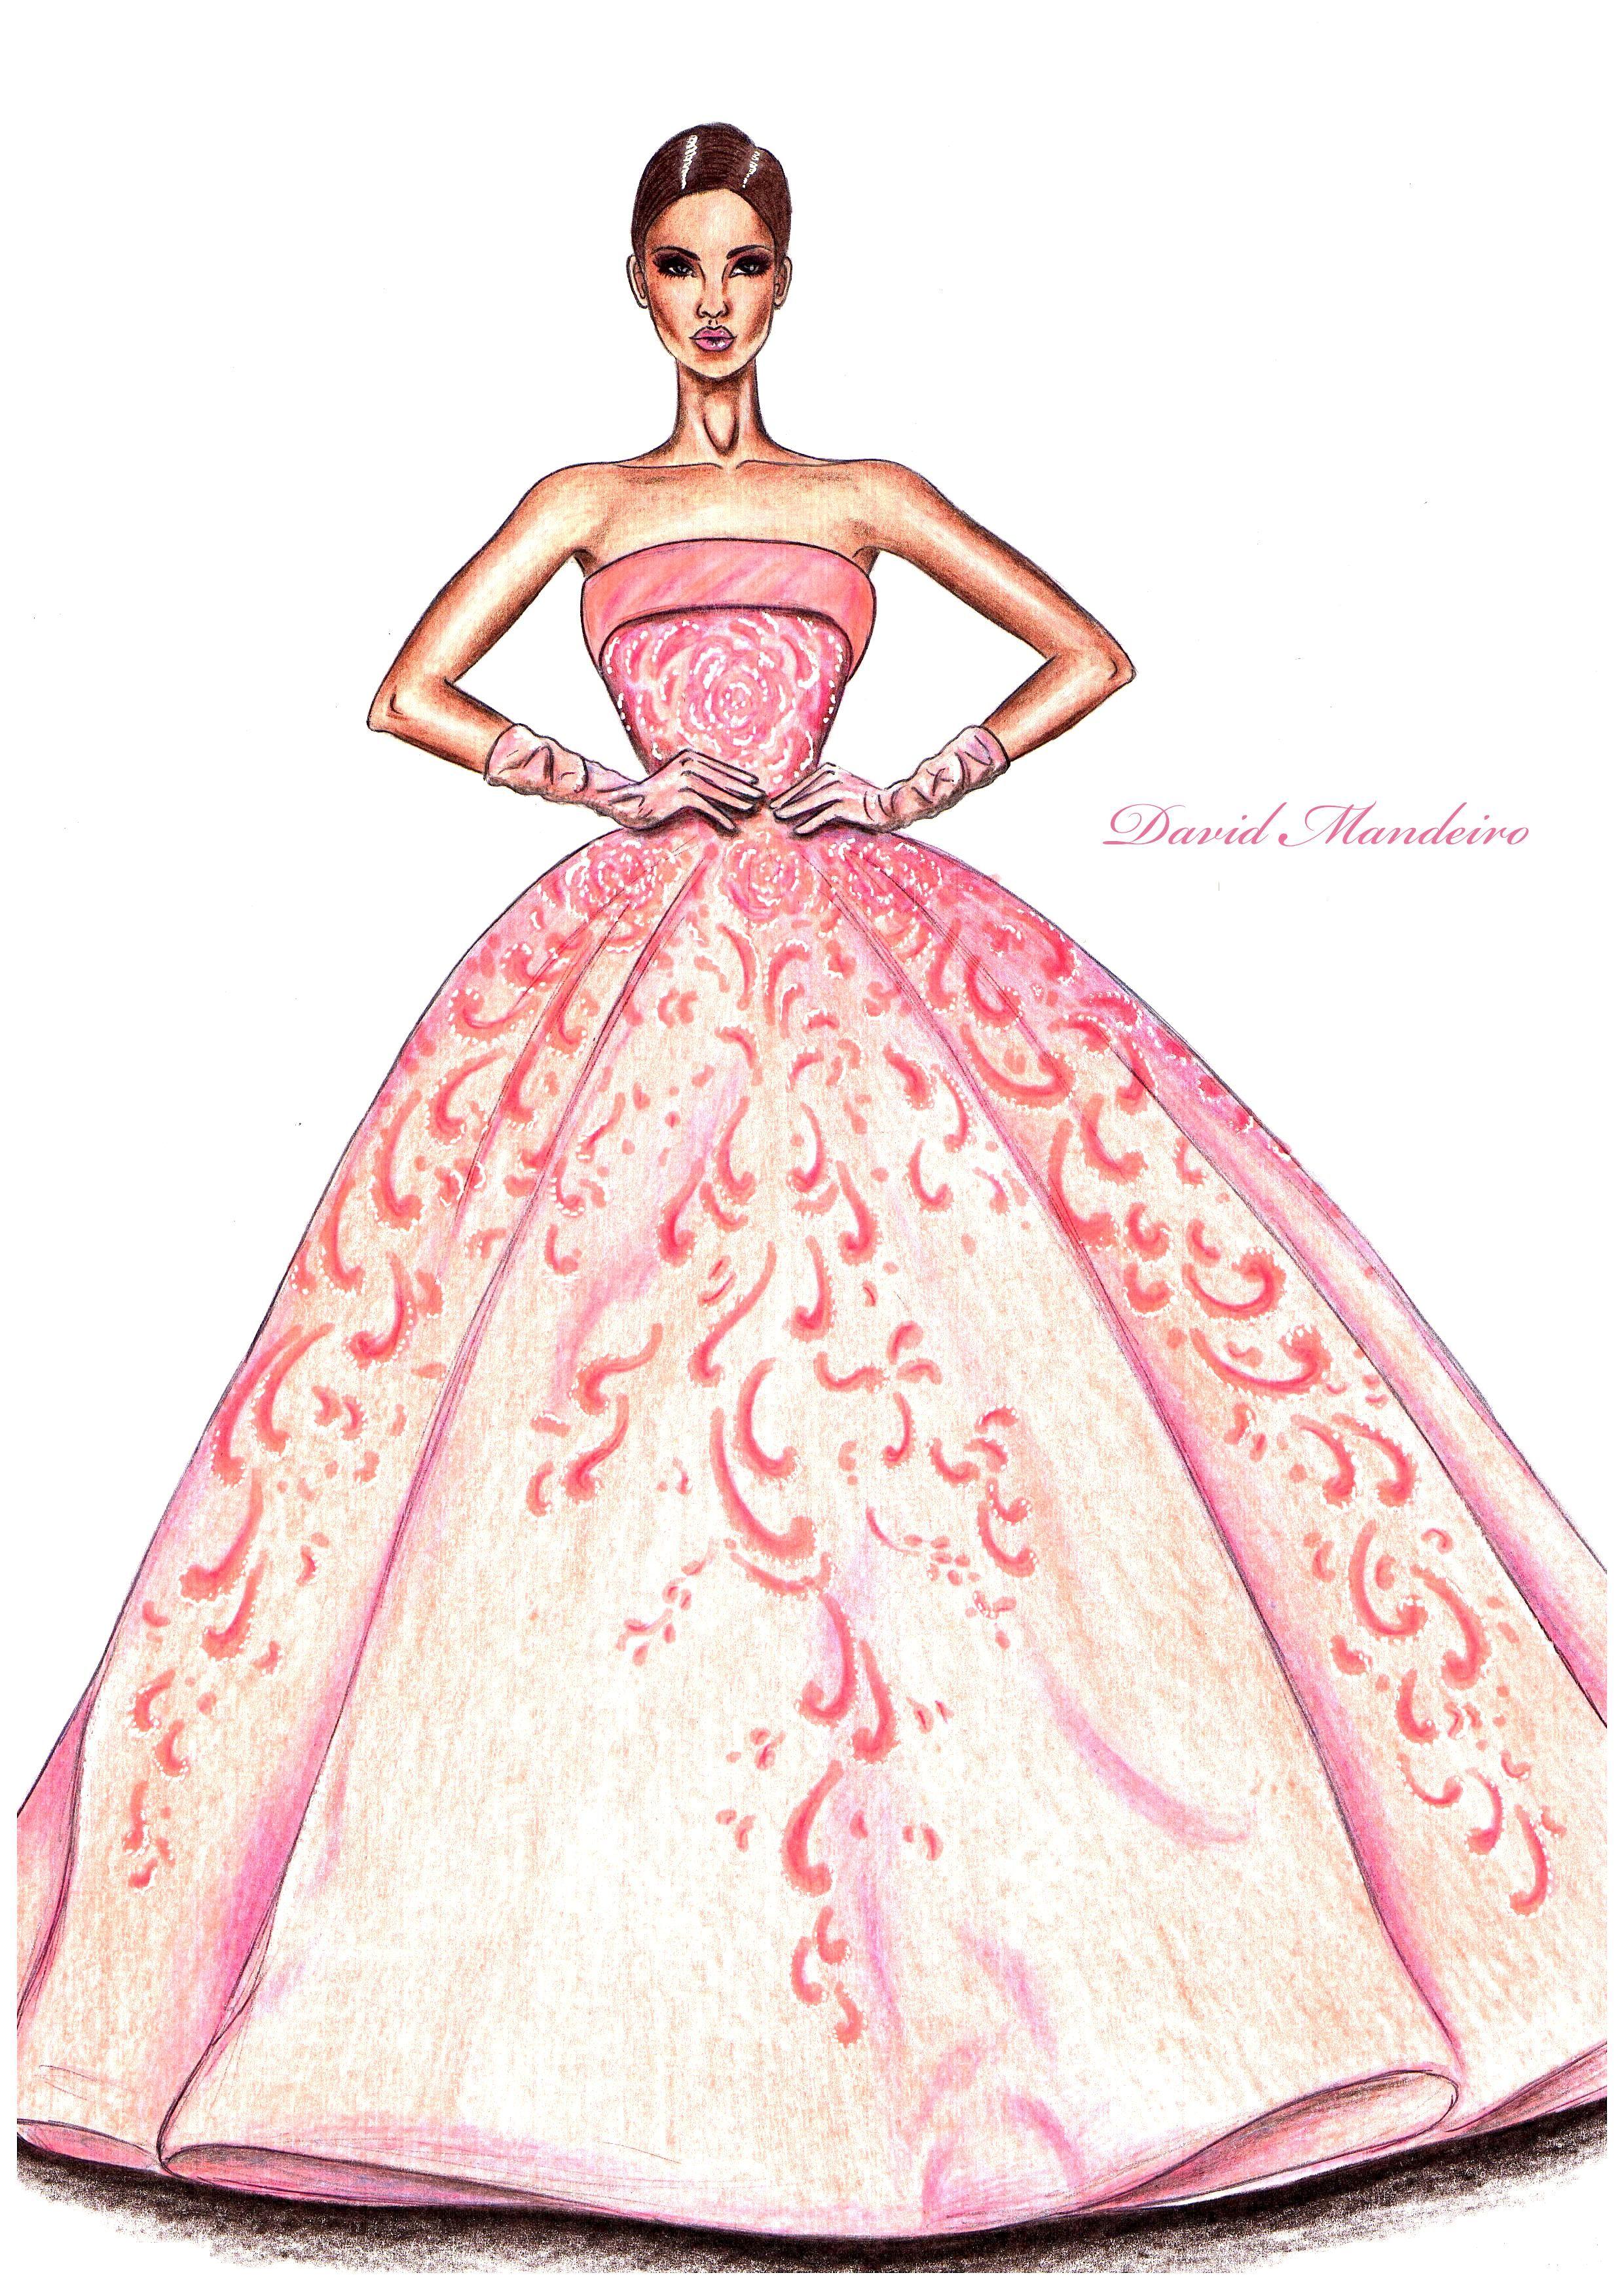 David Mandeiro Illustrations   Fashion art   Pinterest   Figurin ...